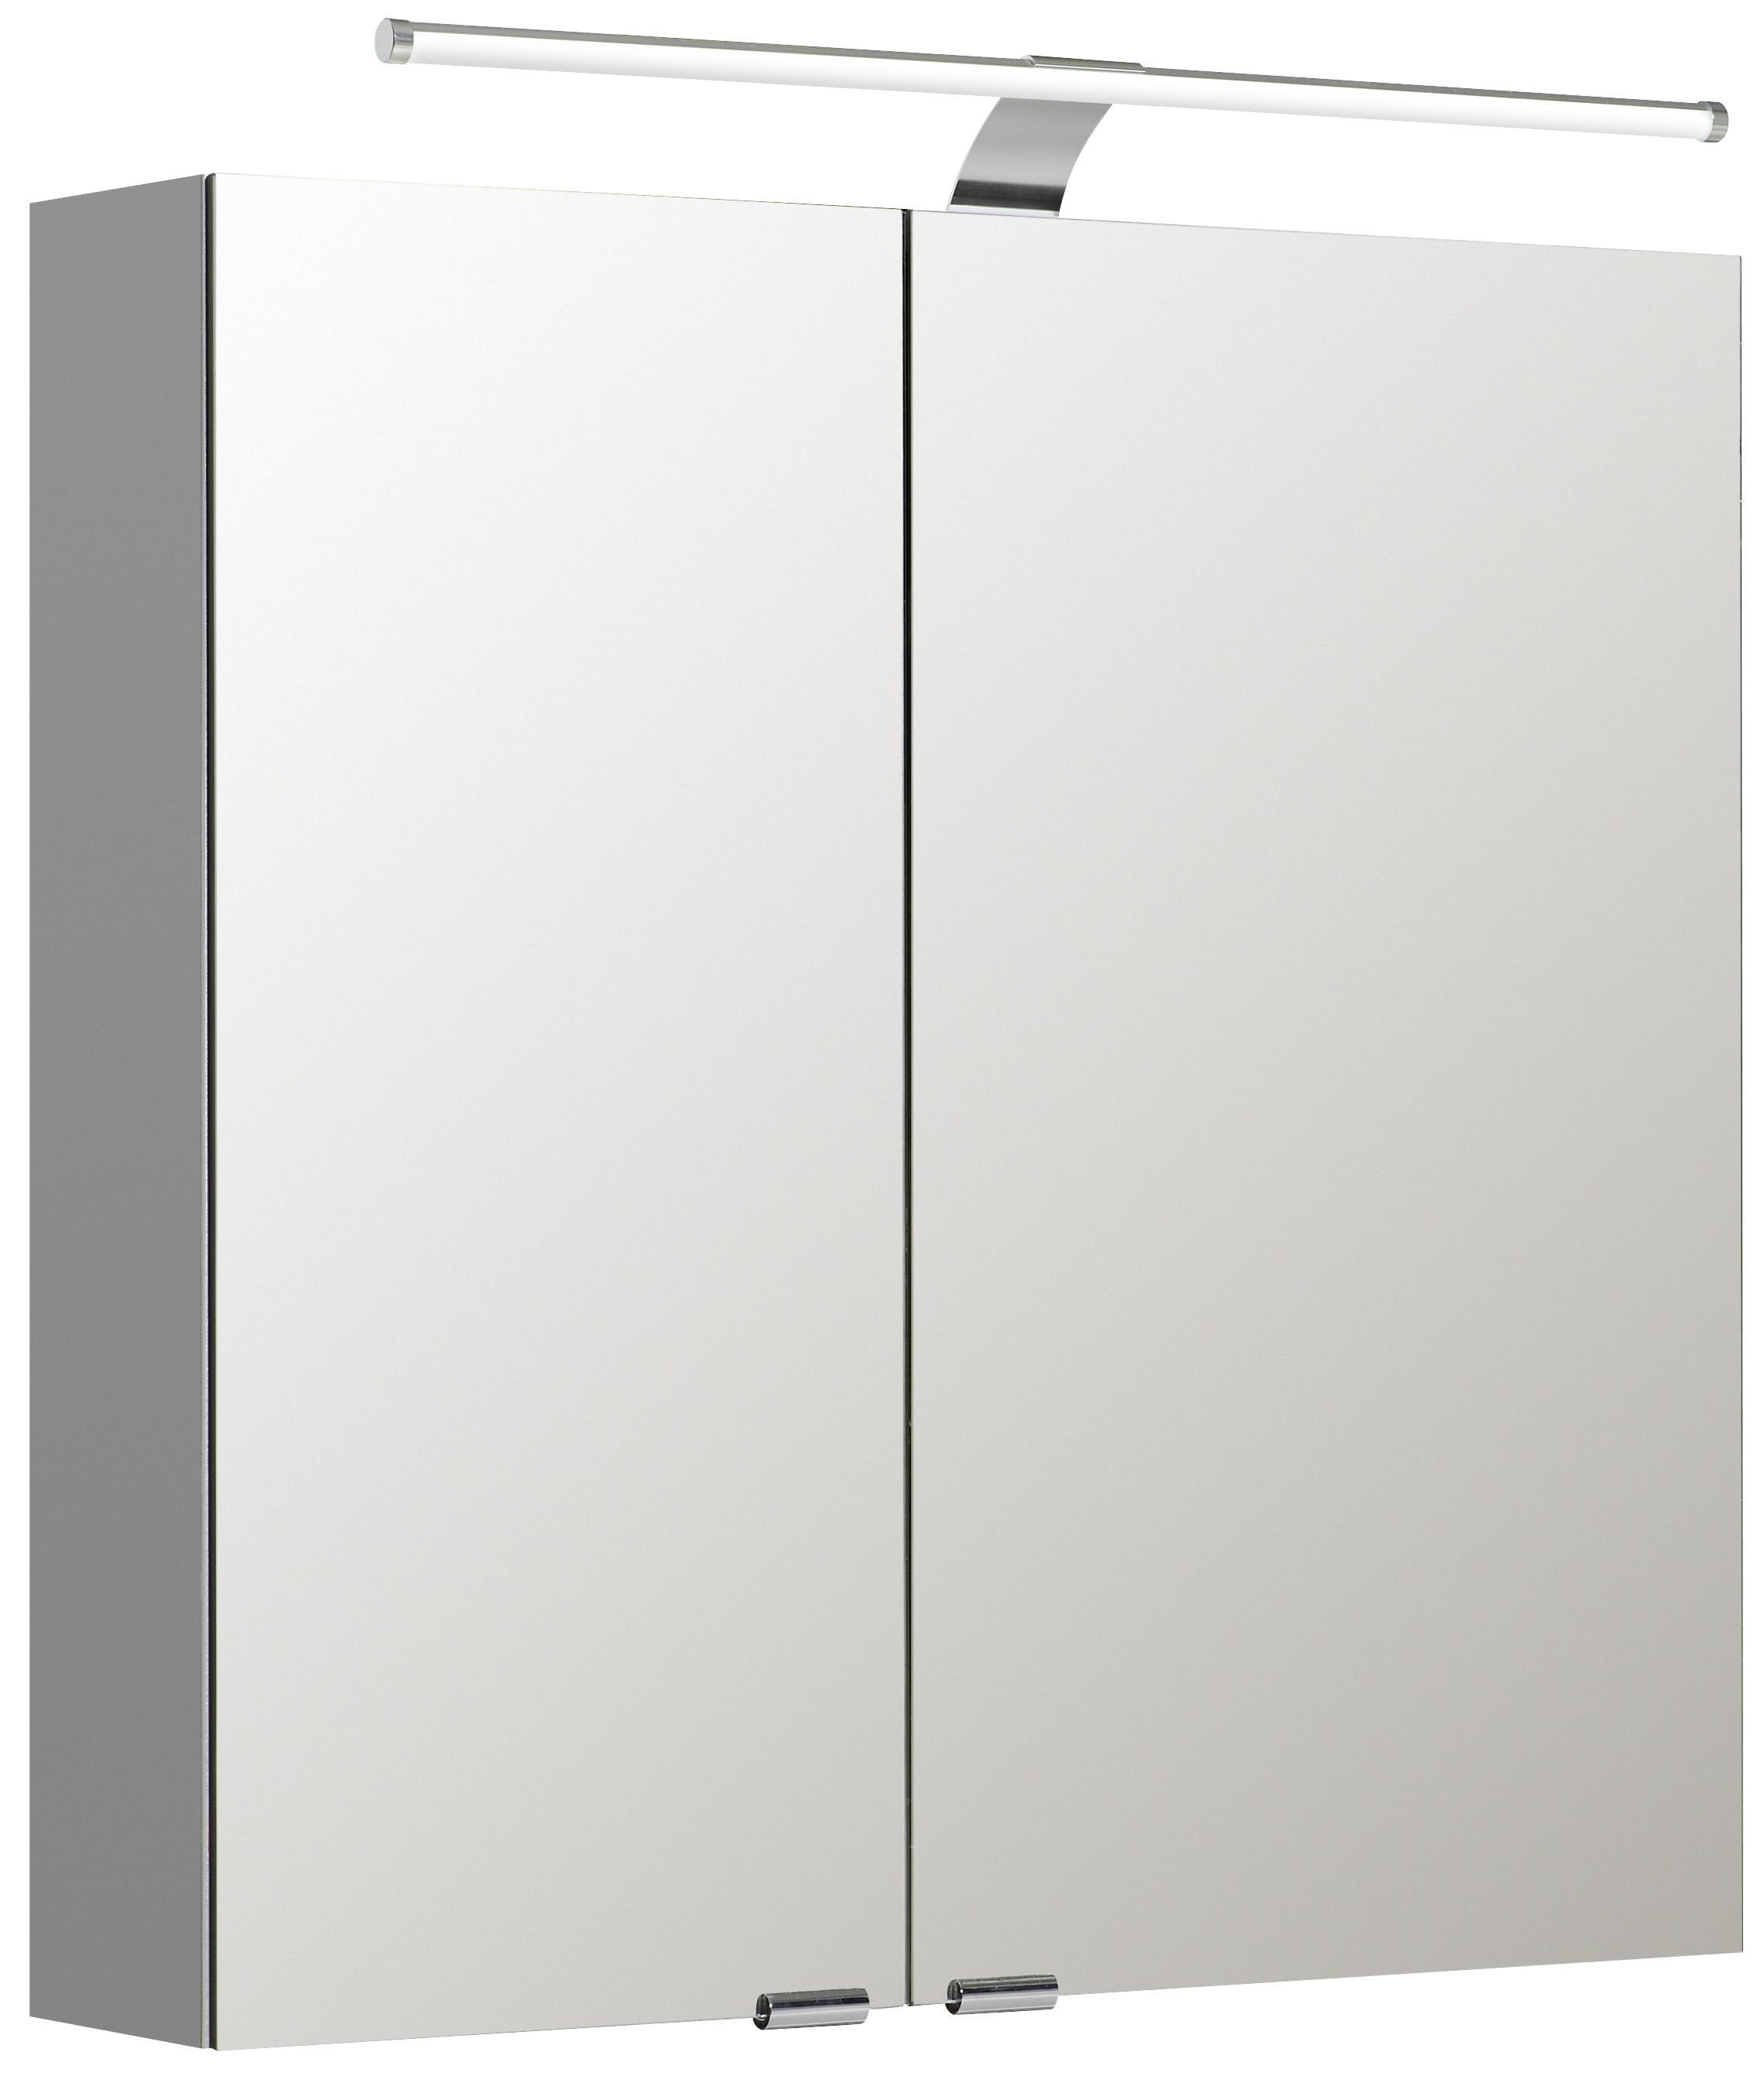 pelipal neutraler spiegelschrank s5 s5 spsd 08 arcom center. Black Bedroom Furniture Sets. Home Design Ideas